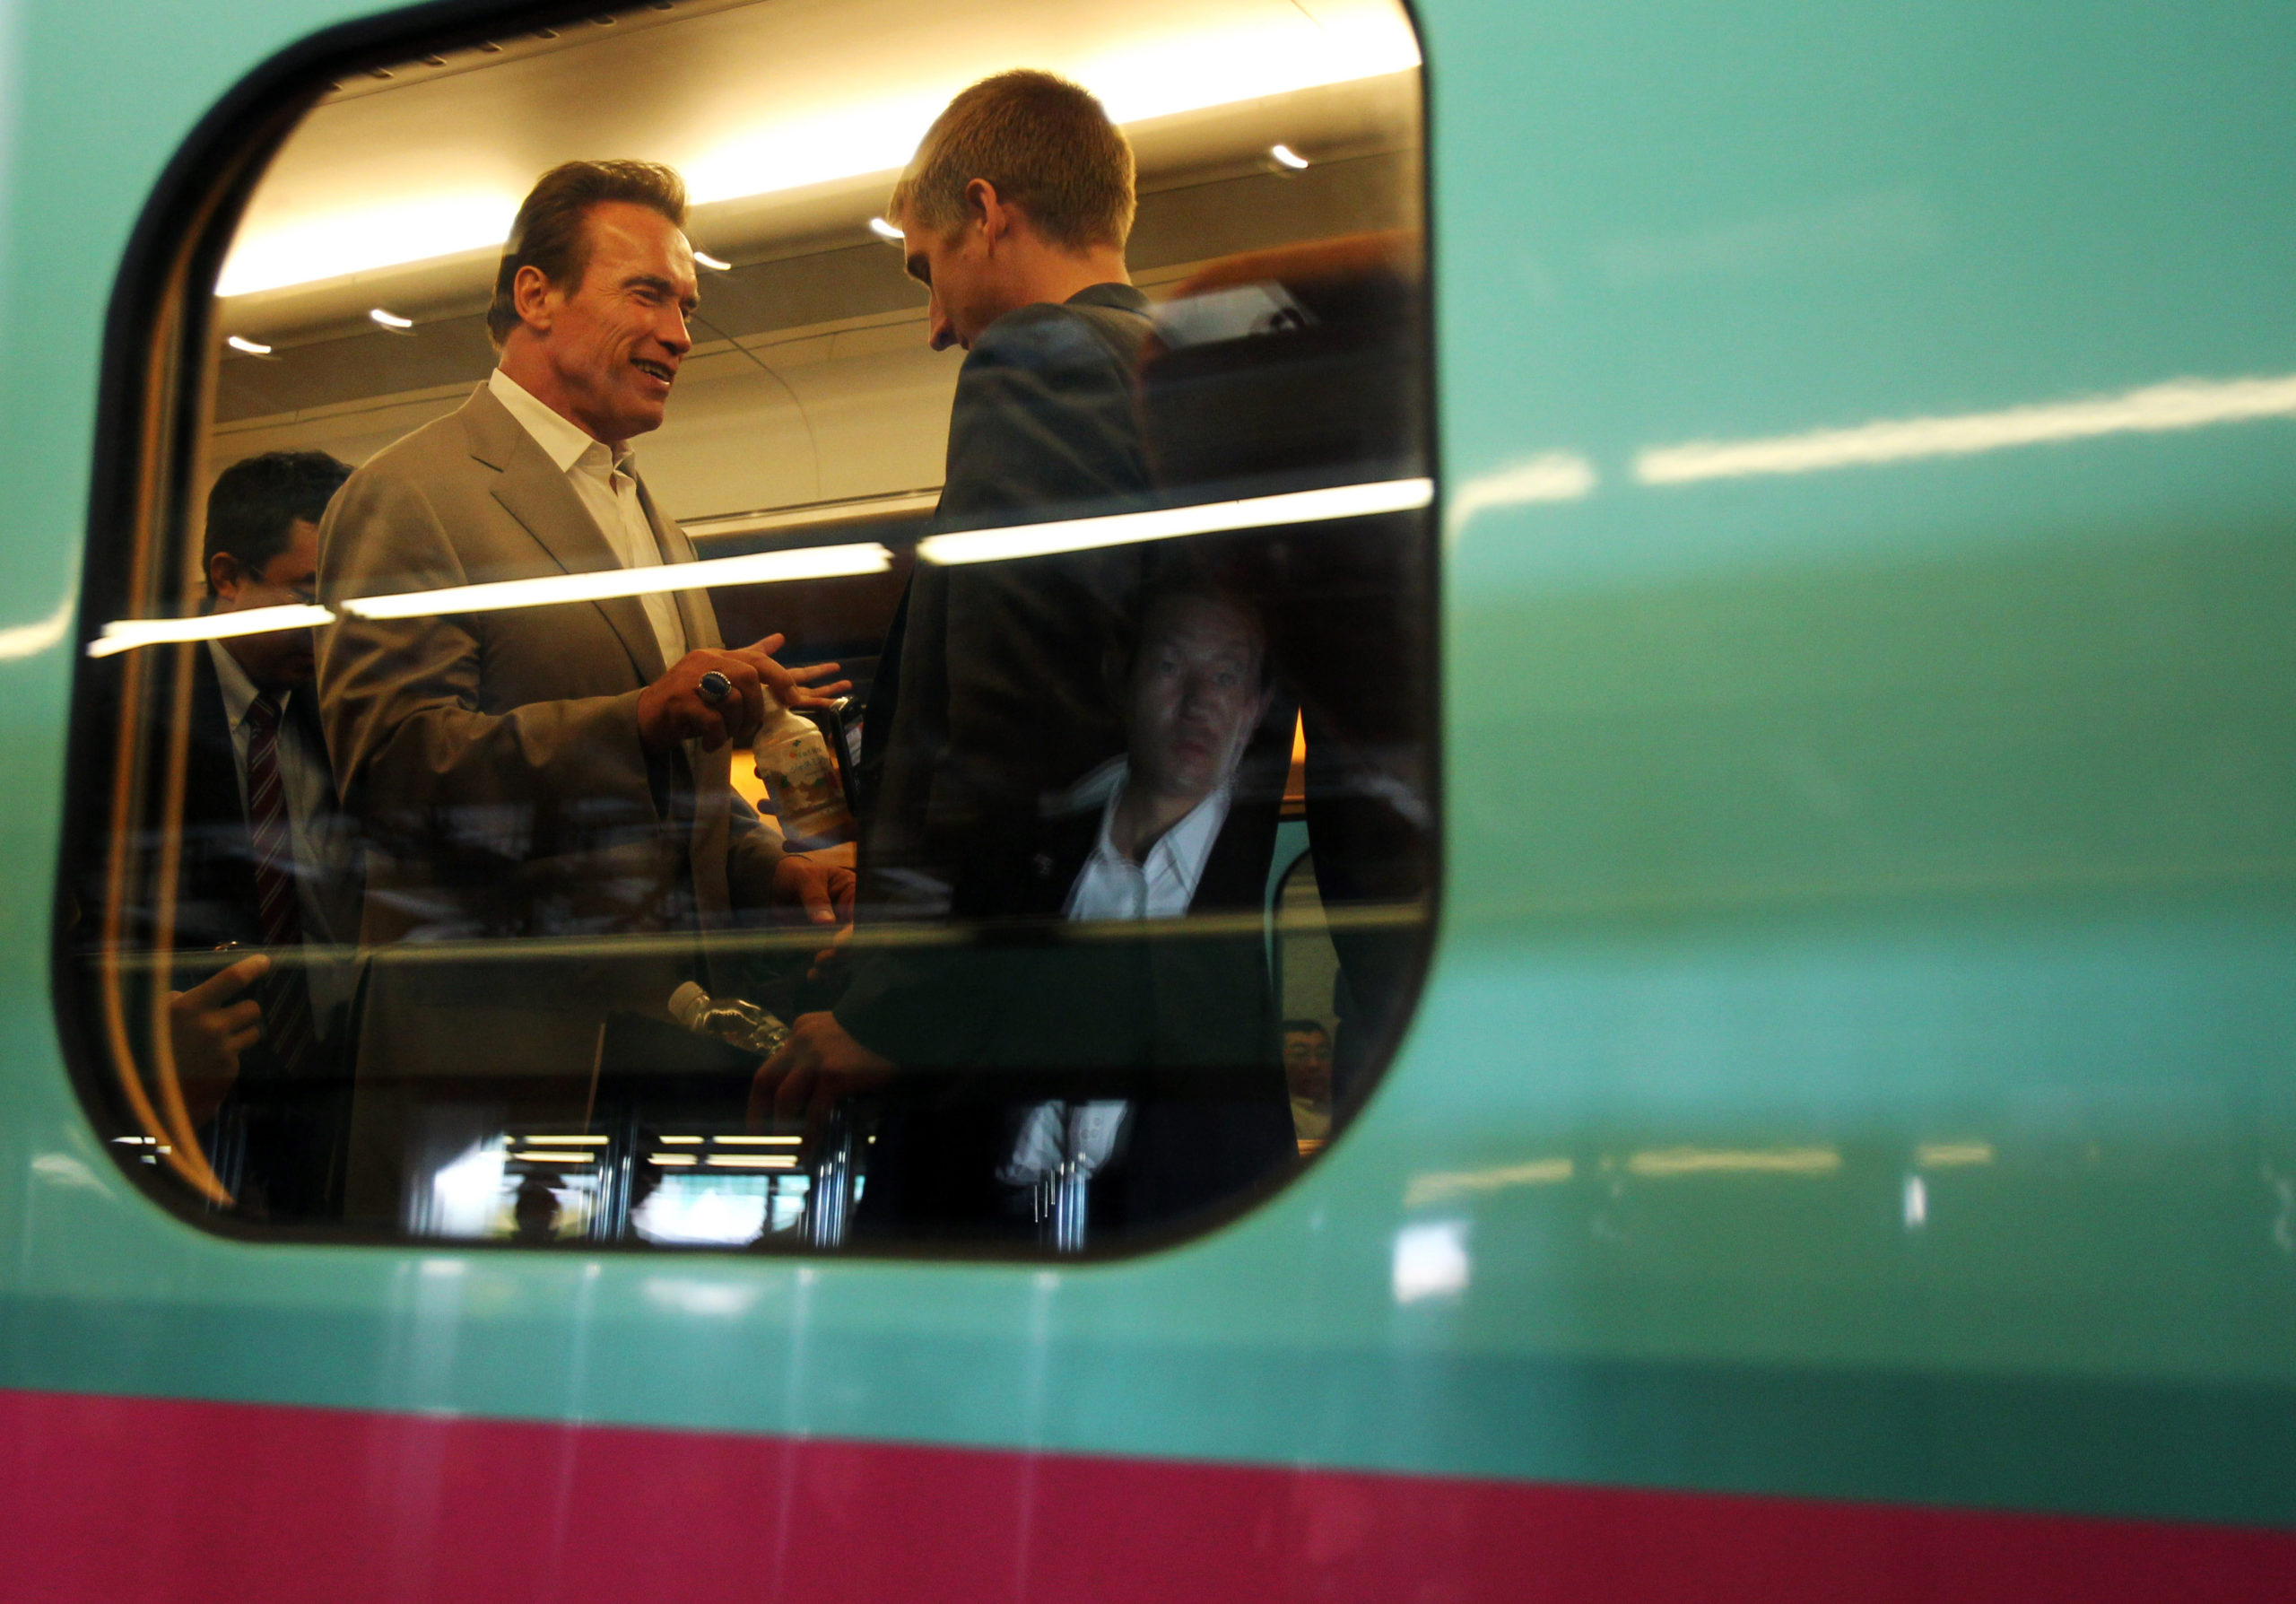 Former California Gov. Arnold Schwarzenegger chats during an inspection of a high-speed train on Sept. 14, 2010. (Shuji Kajiyama/AFP via Getty Images)